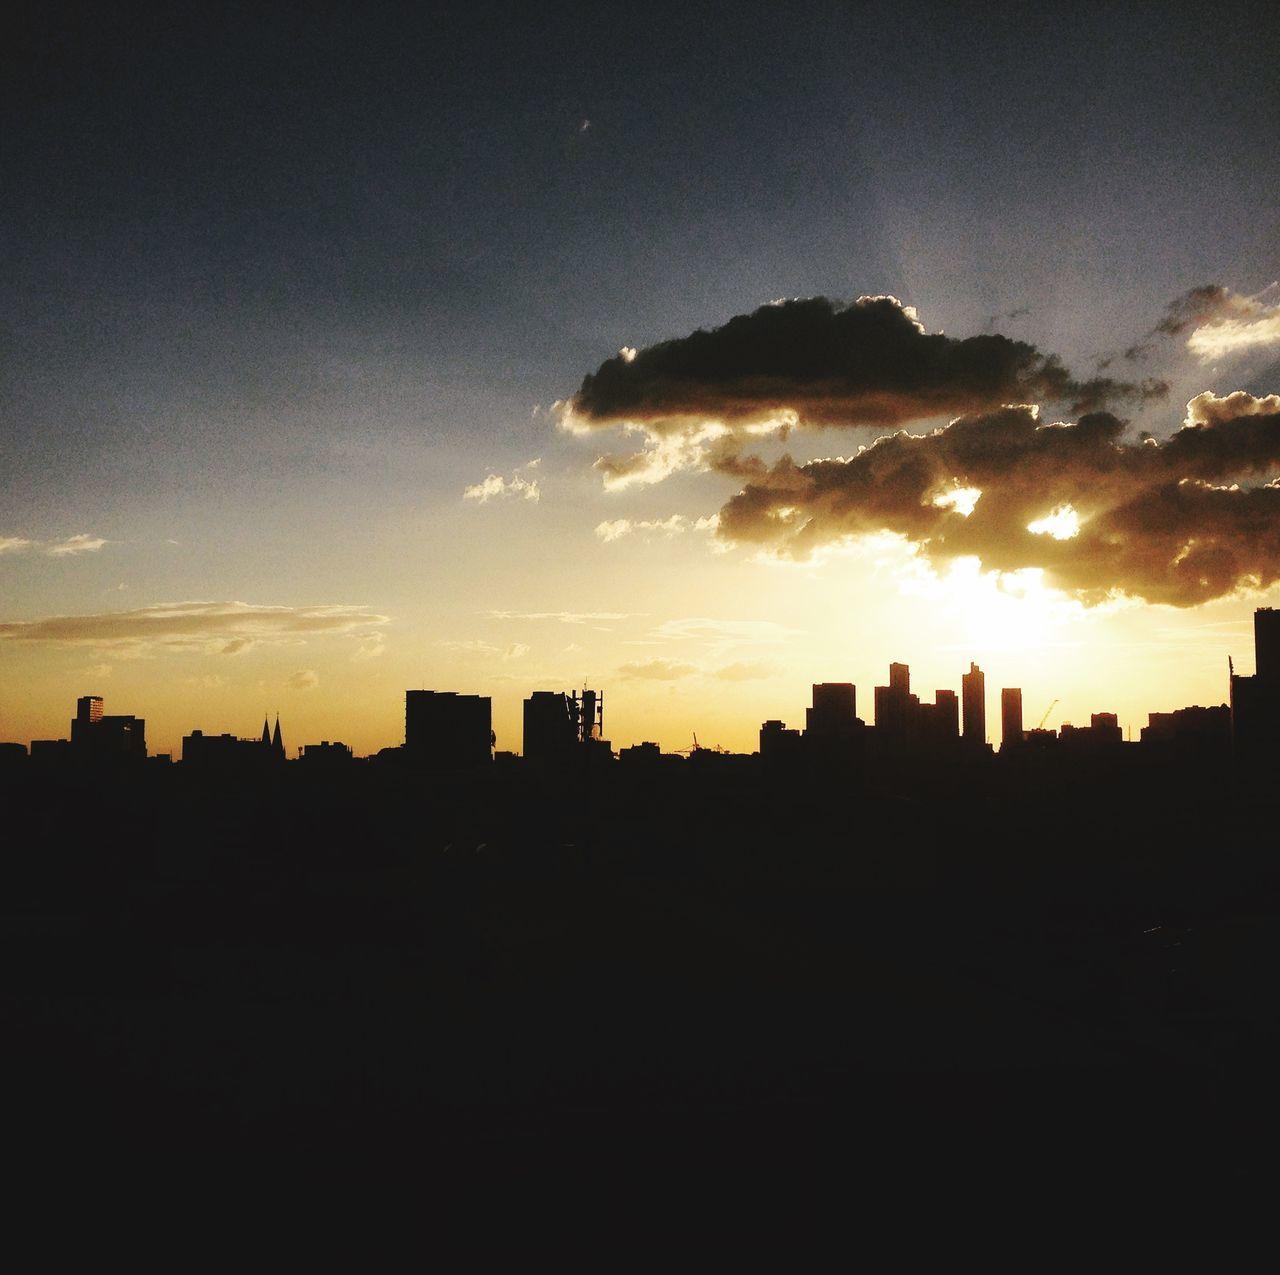 sky, silhouette, cloud - sky, built structure, architecture, building exterior, sunset, no people, nature, city, landscape, building, cityscape, outdoors, urban skyline, orange color, sunlight, beauty in nature, copy space, sun, dark, skyscraper, office building exterior